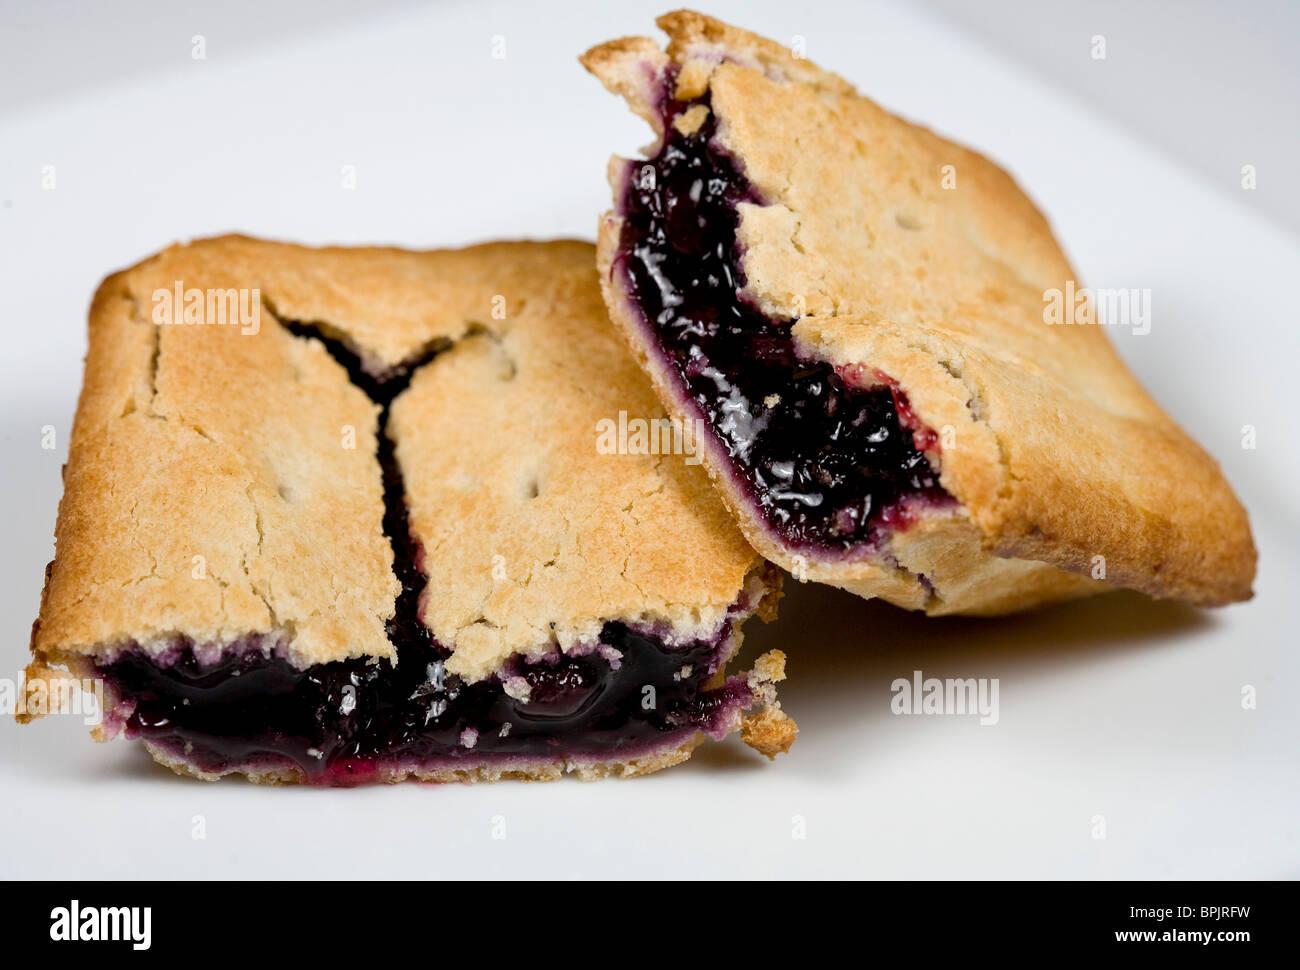 Tastykake blueberry fruit pie. - Stock Image